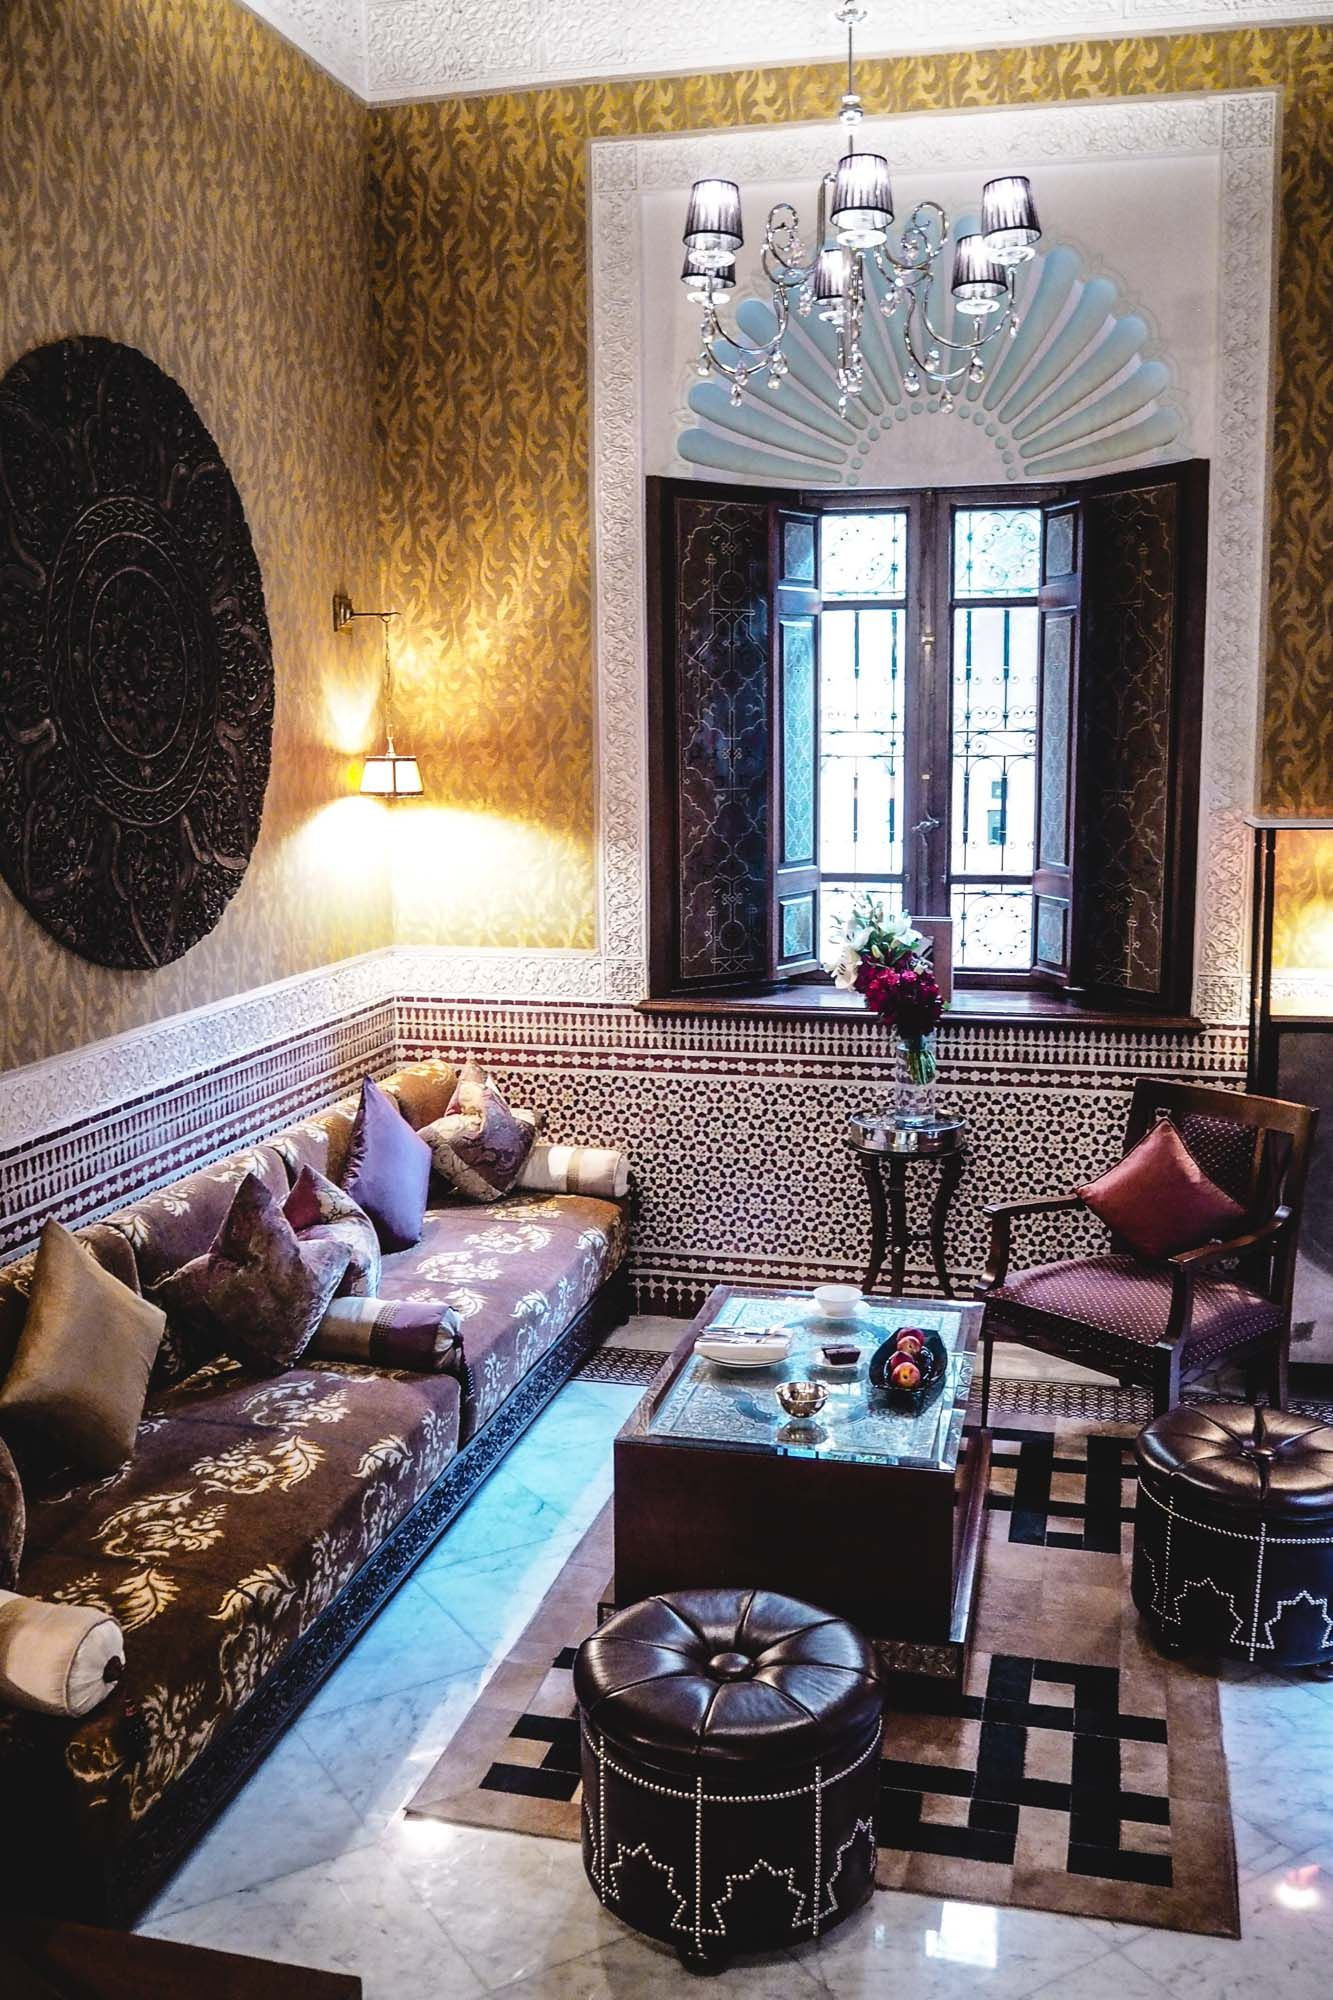 the royal mansour marrakech morocco, riad lounge area, luxury, Wohnzimmer dekoo